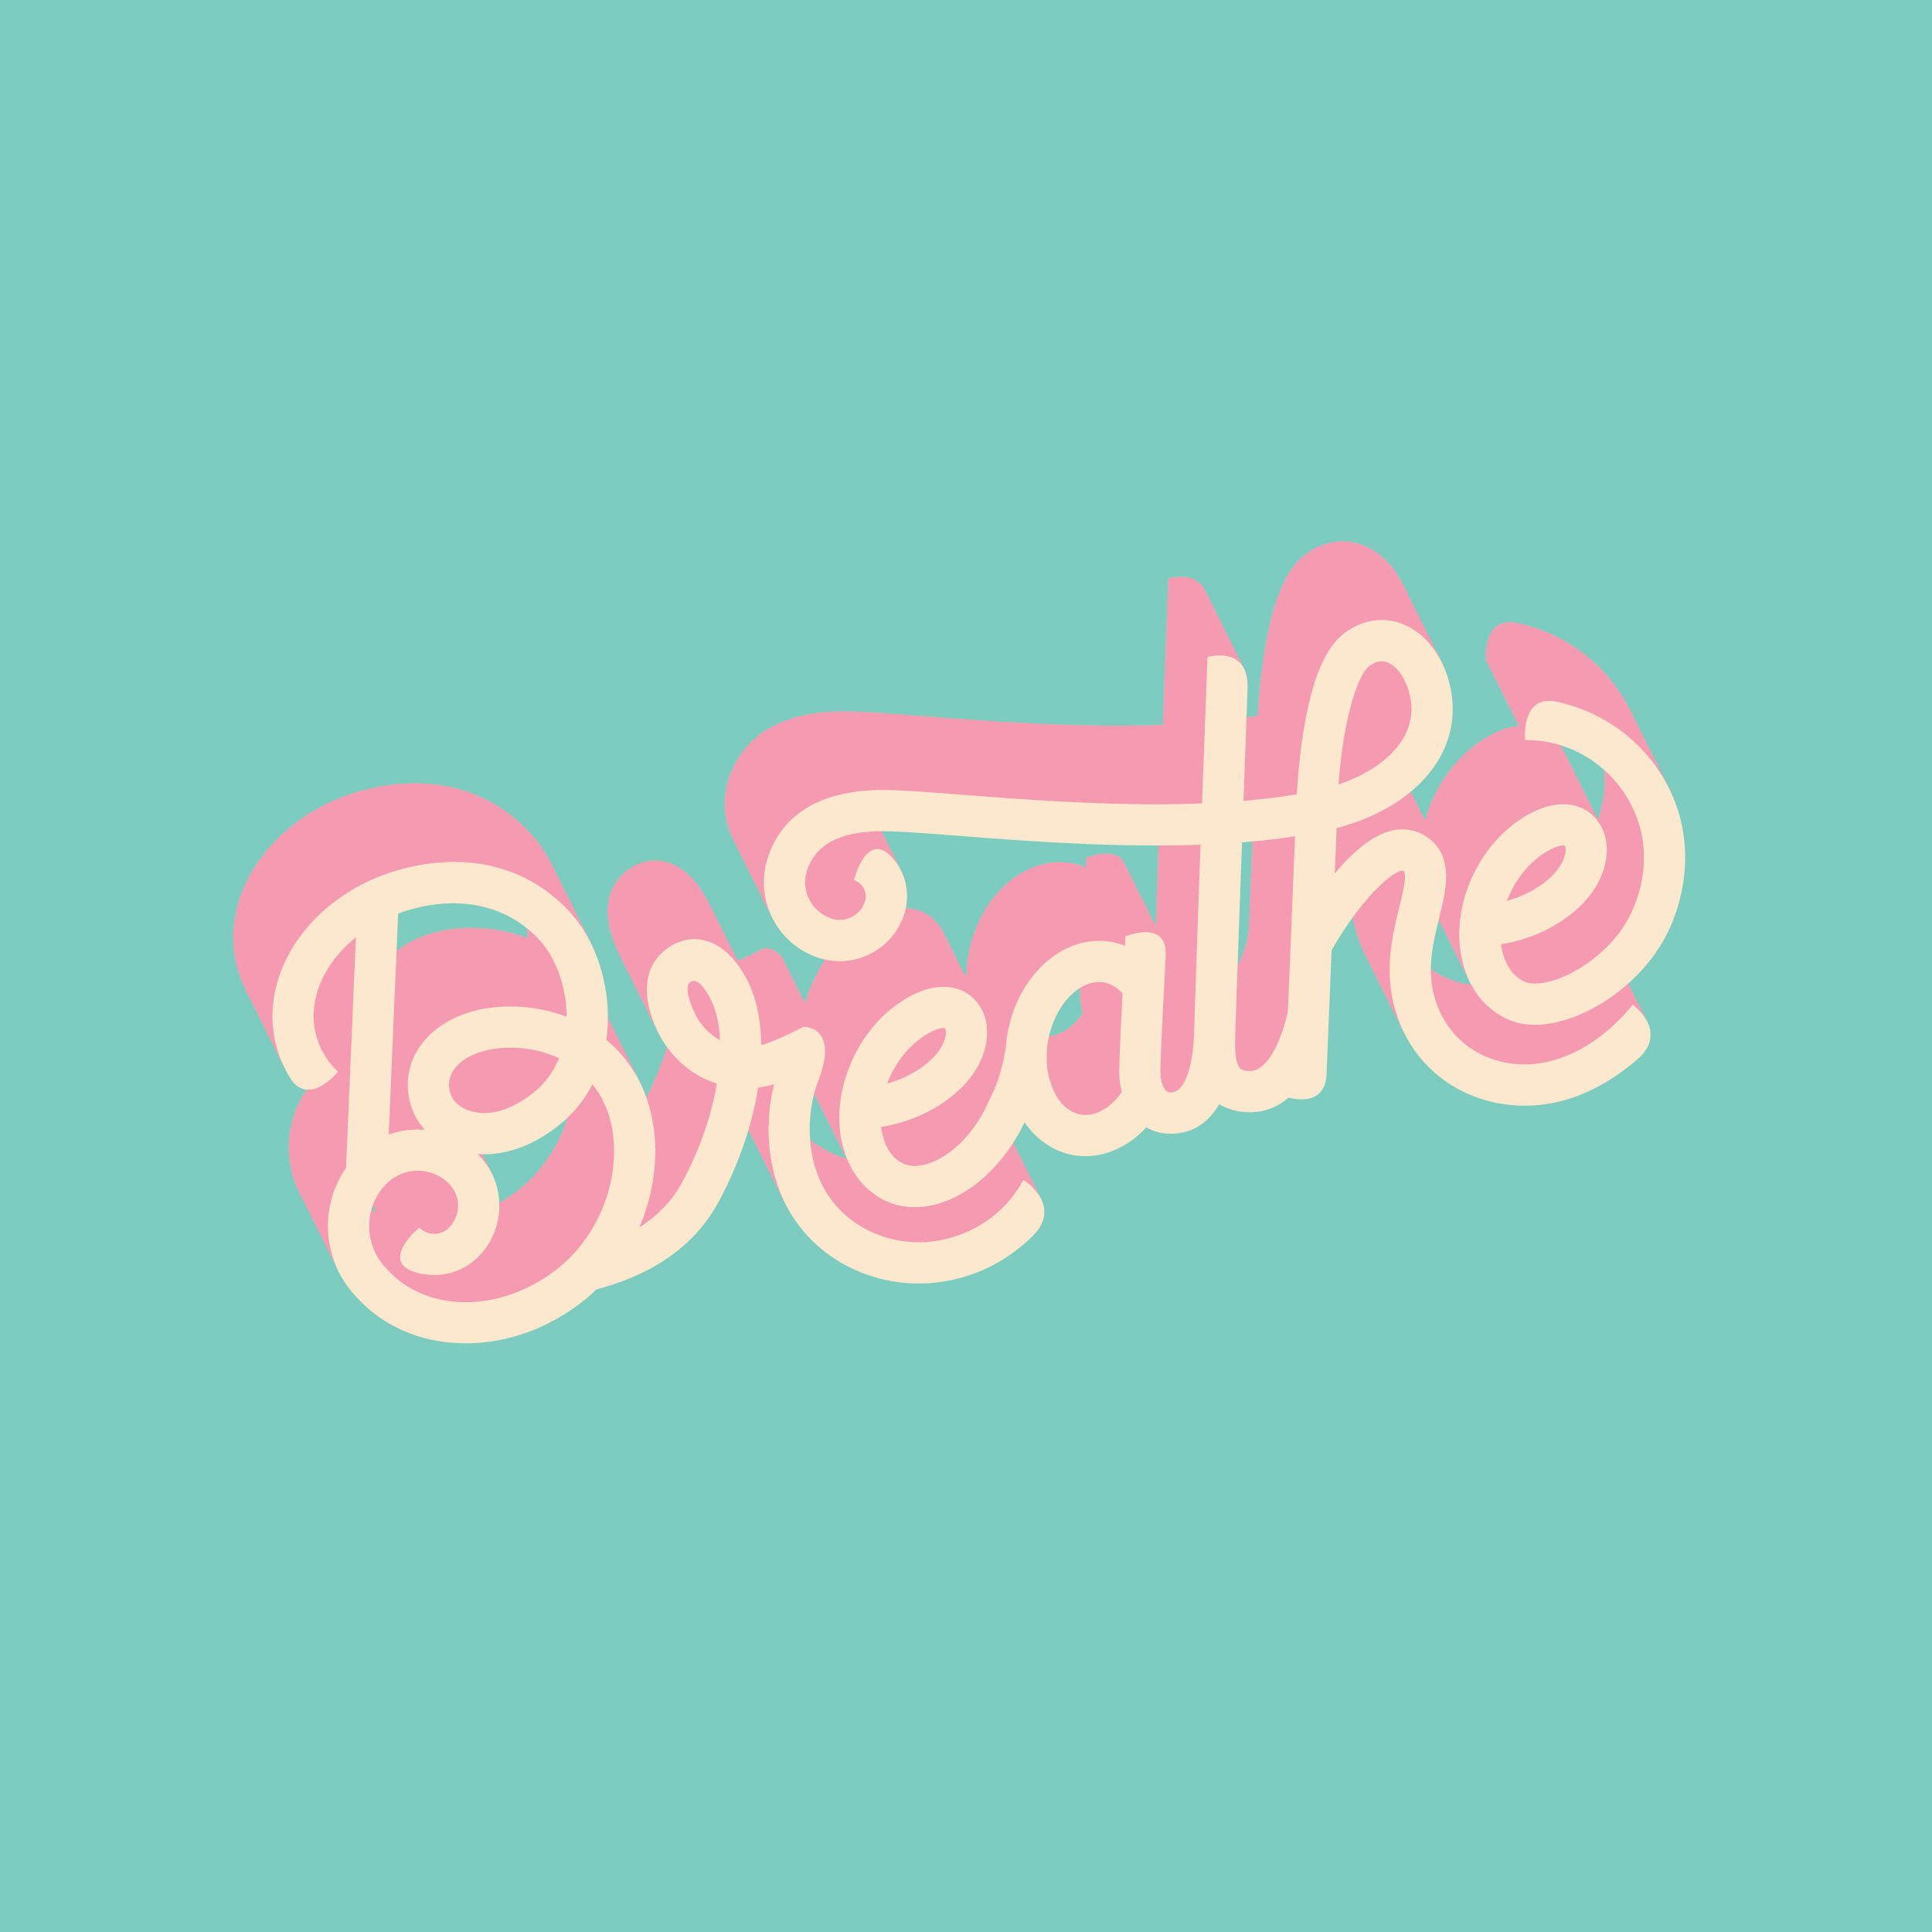 Breathenew-01.jpg